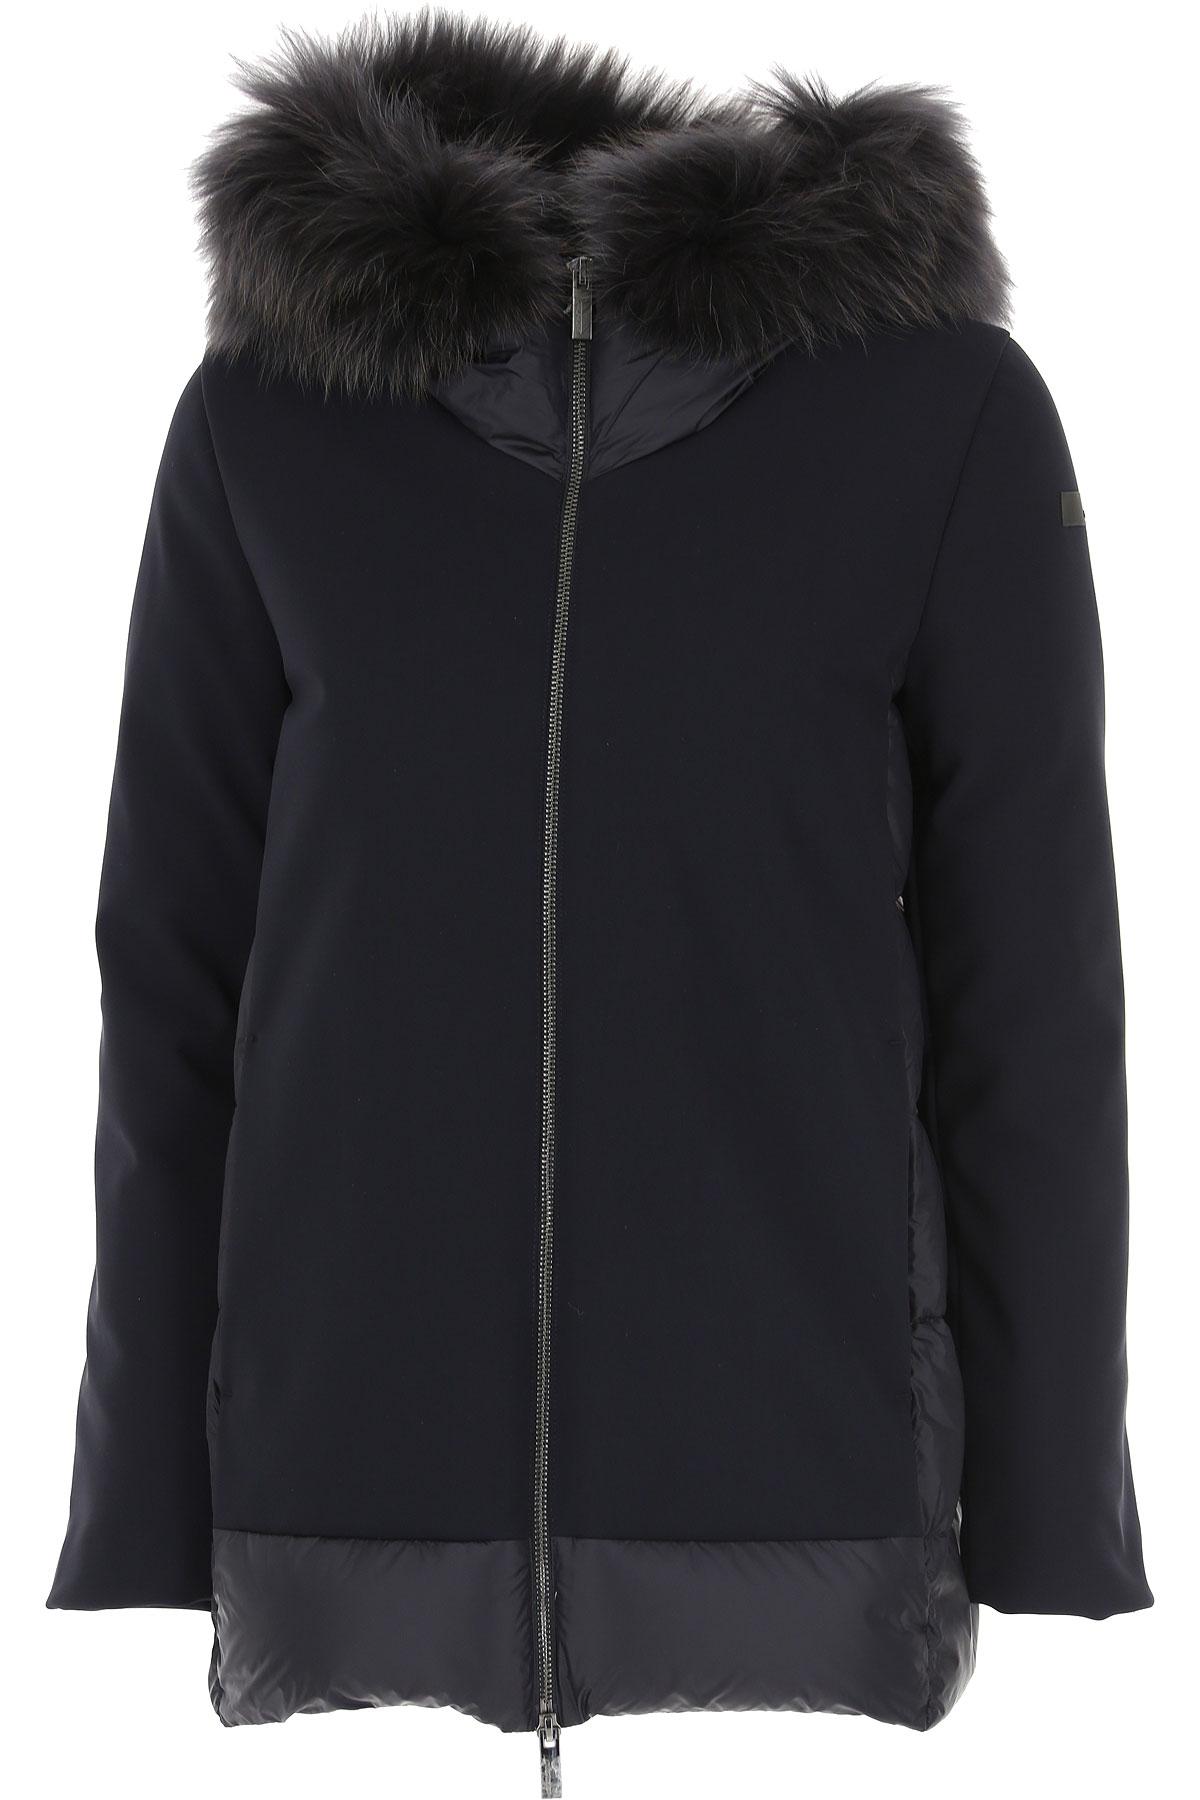 RRD Jacket for Women On Sale, Navy Blue, polyamide, 2019, 4 6 8